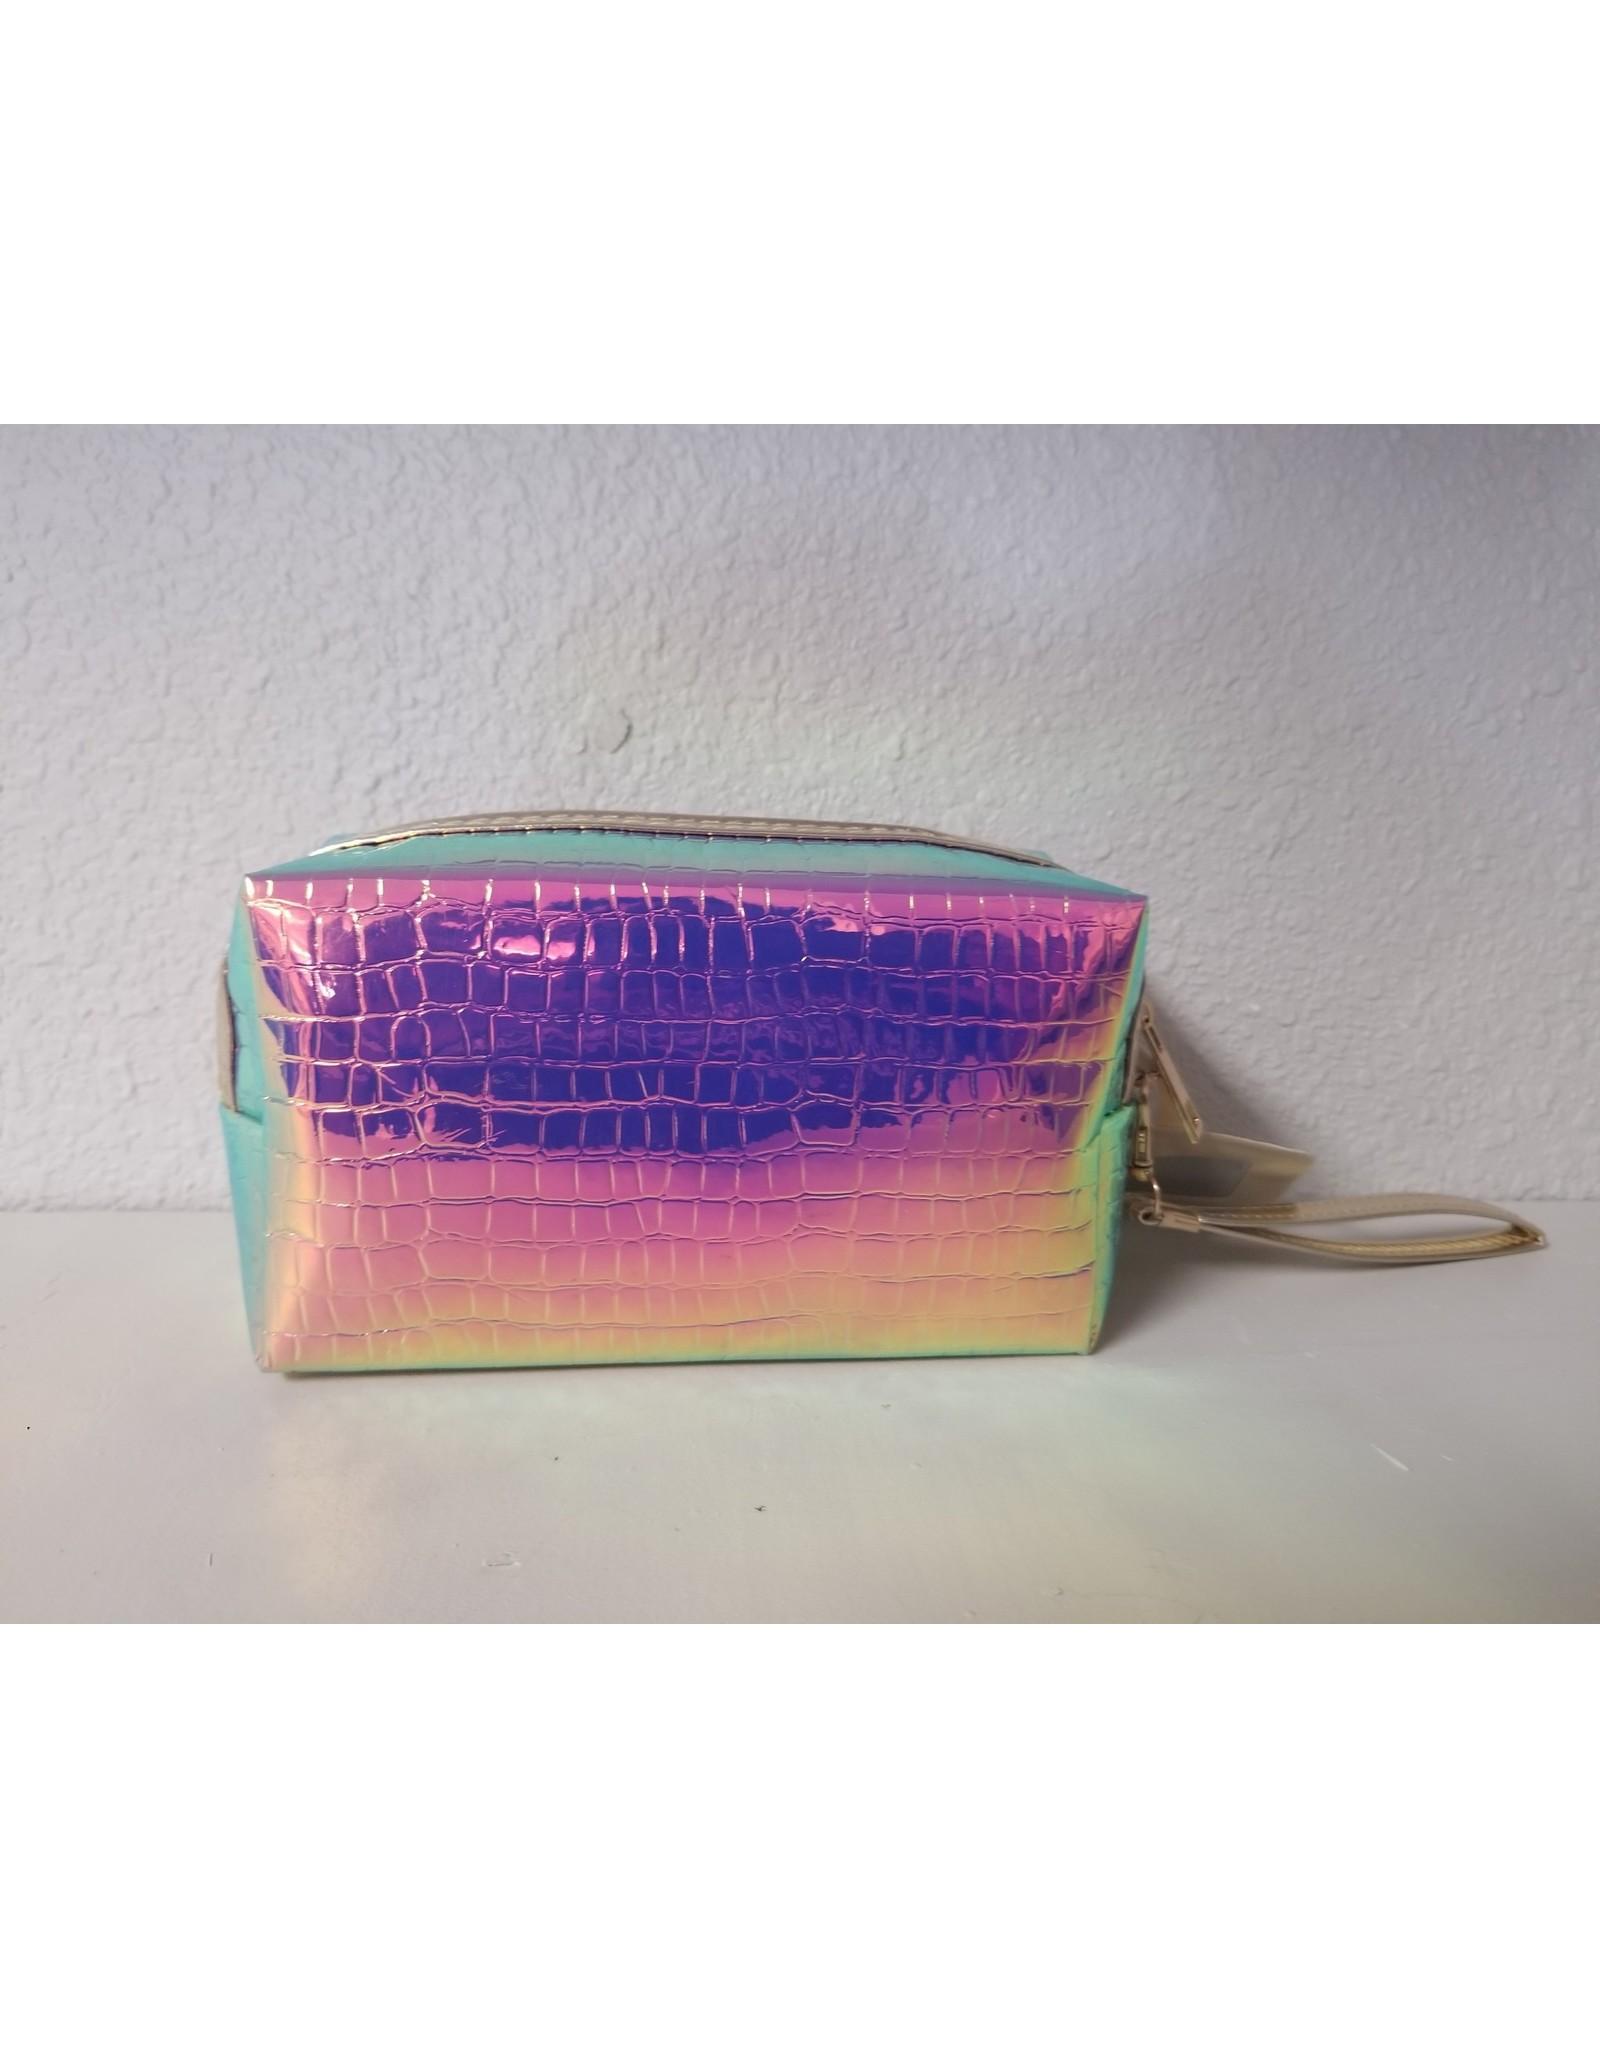 Hologram Makeup Bag with Mirror